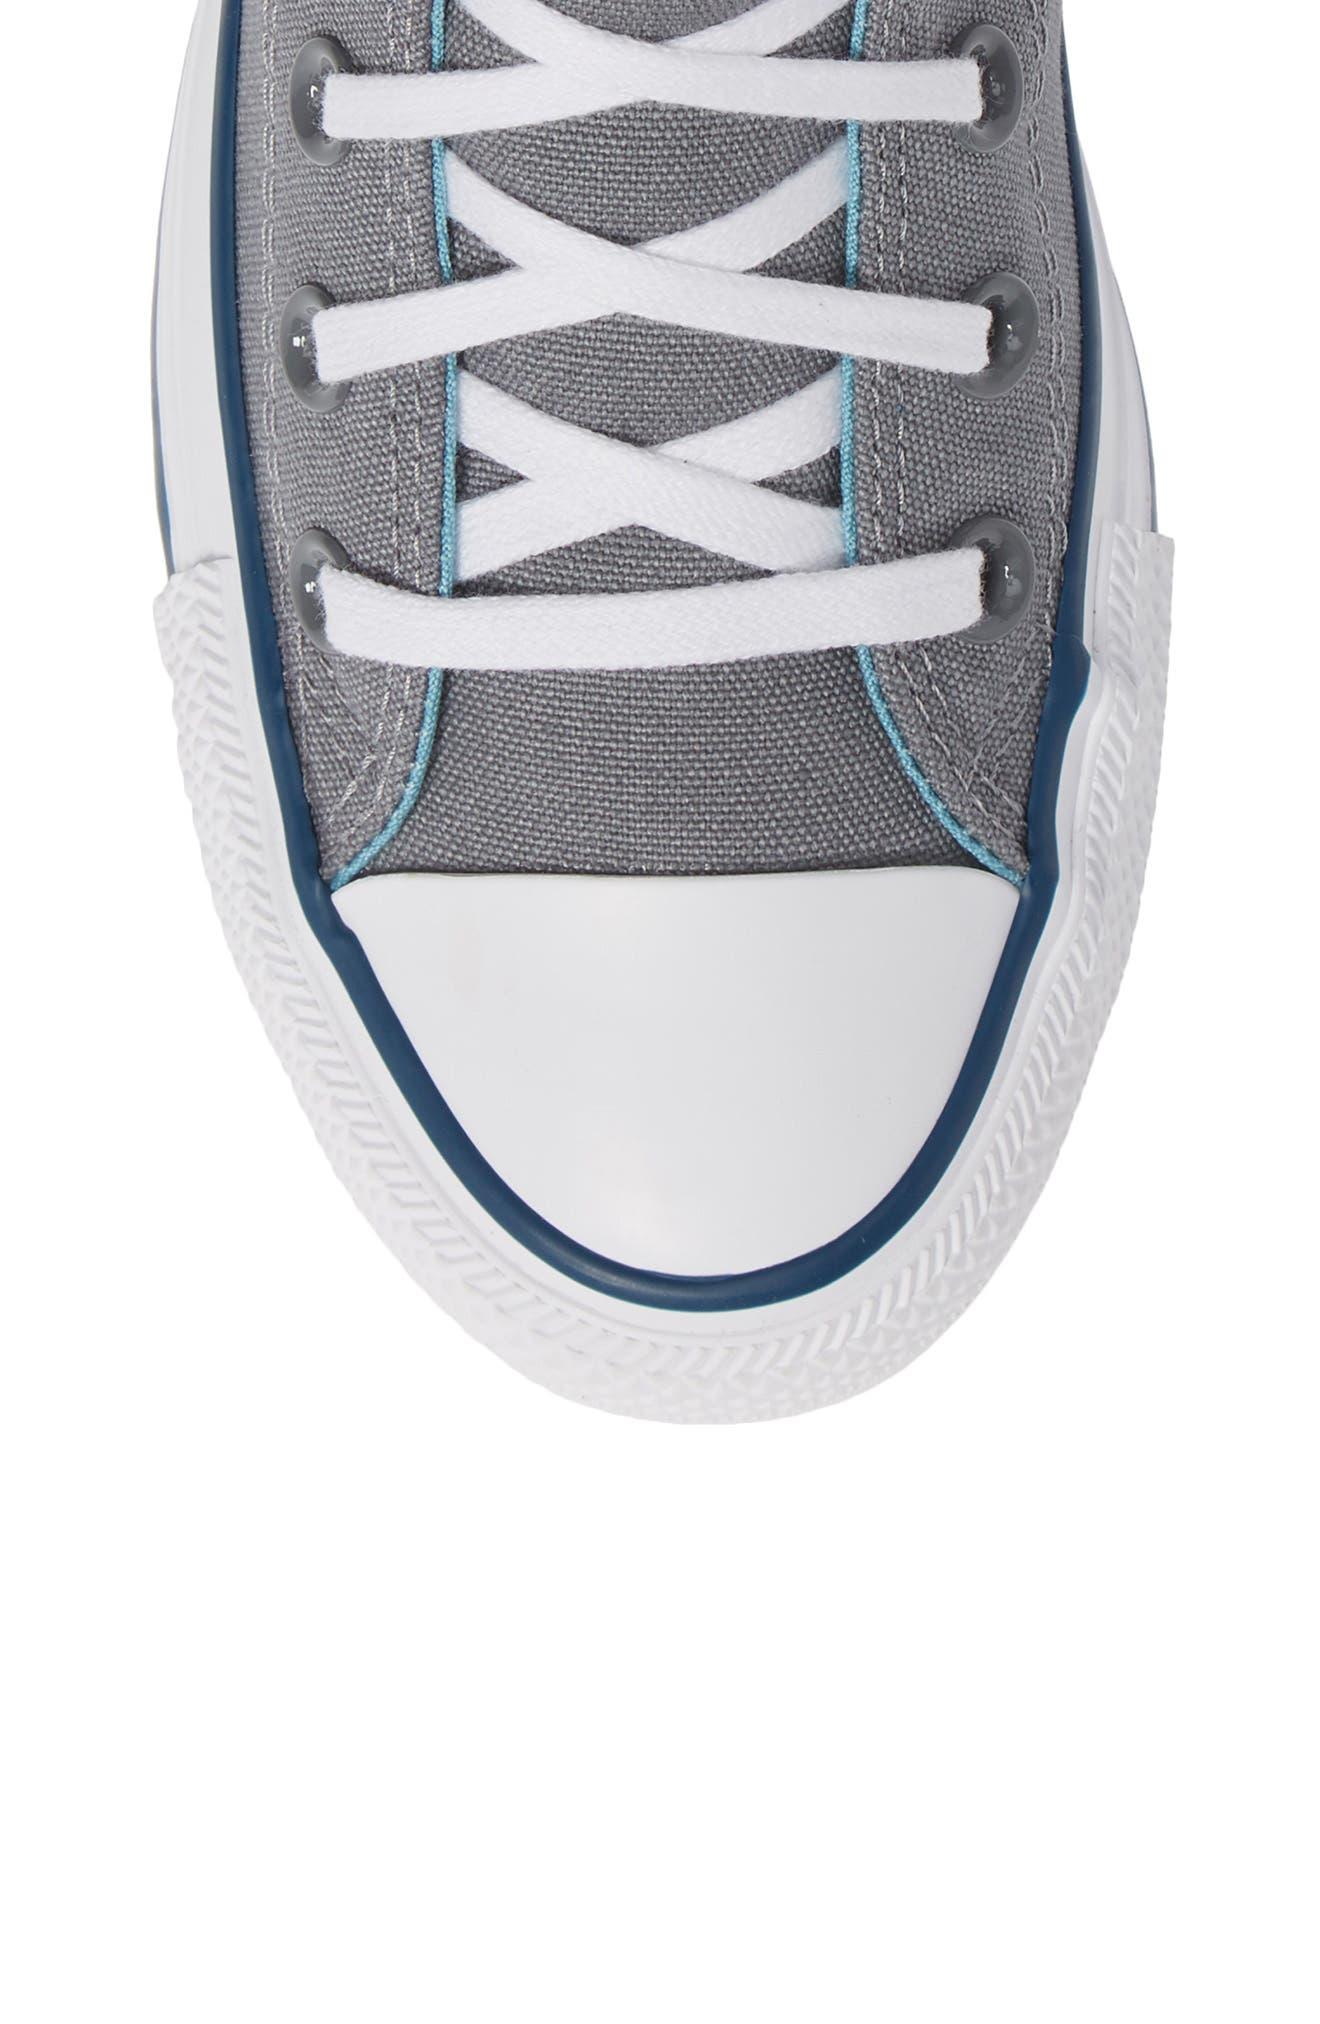 CONVERSE, Chuck Taylor<sup>®</sup> All Star<sup>®</sup> Seasonal Hi Sneaker, Alternate thumbnail 5, color, 039